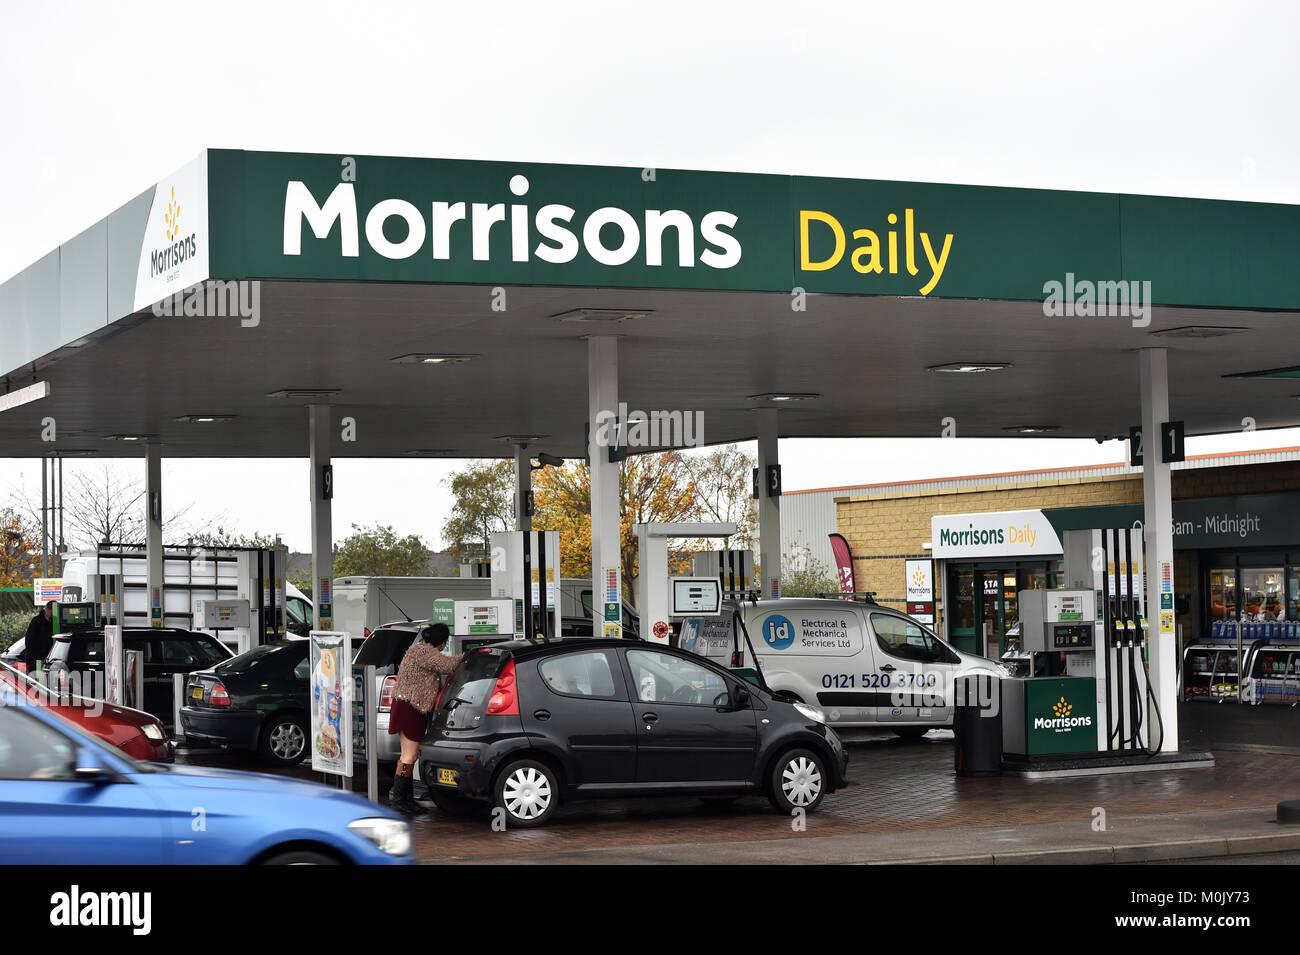 Morrisons petrol station Bradford UK - Stock Image